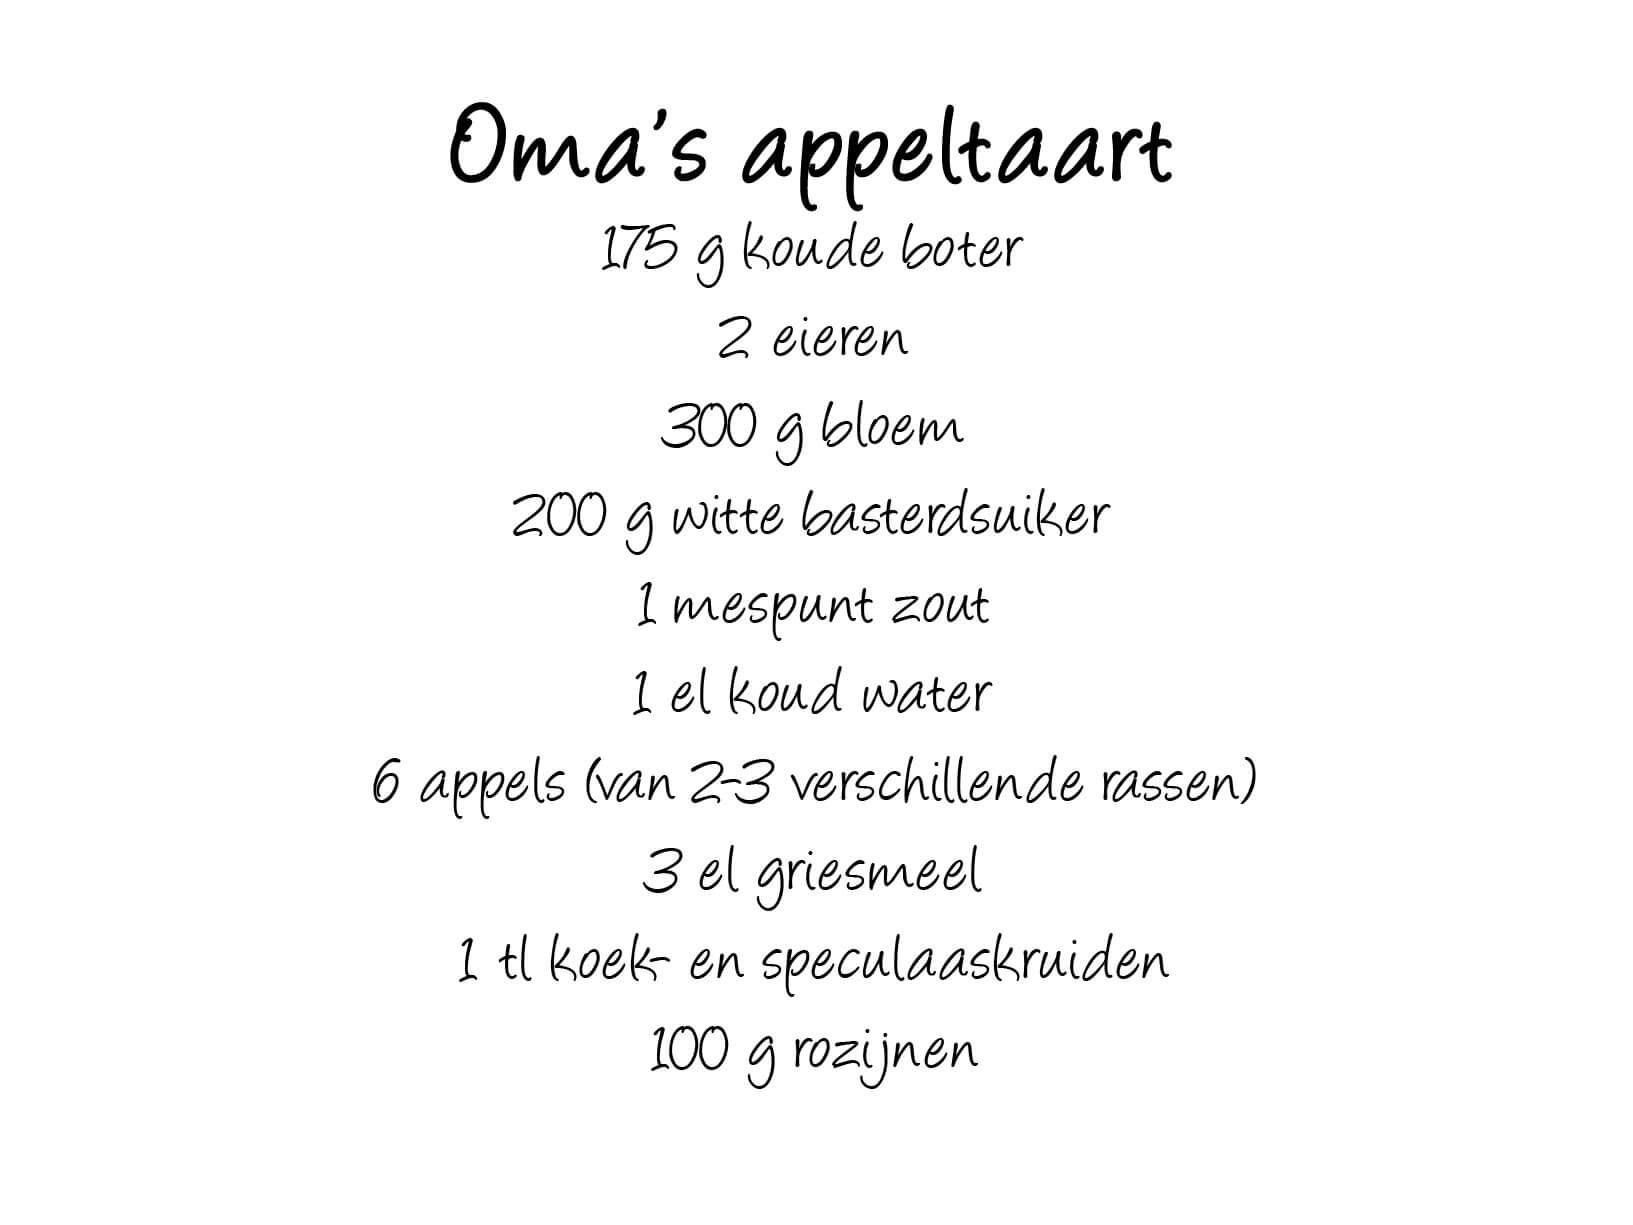 "Muurstickers Keuken Appeltaart : Muursticker recept ""oma's appeltaart"" – Keuken muurstickers"